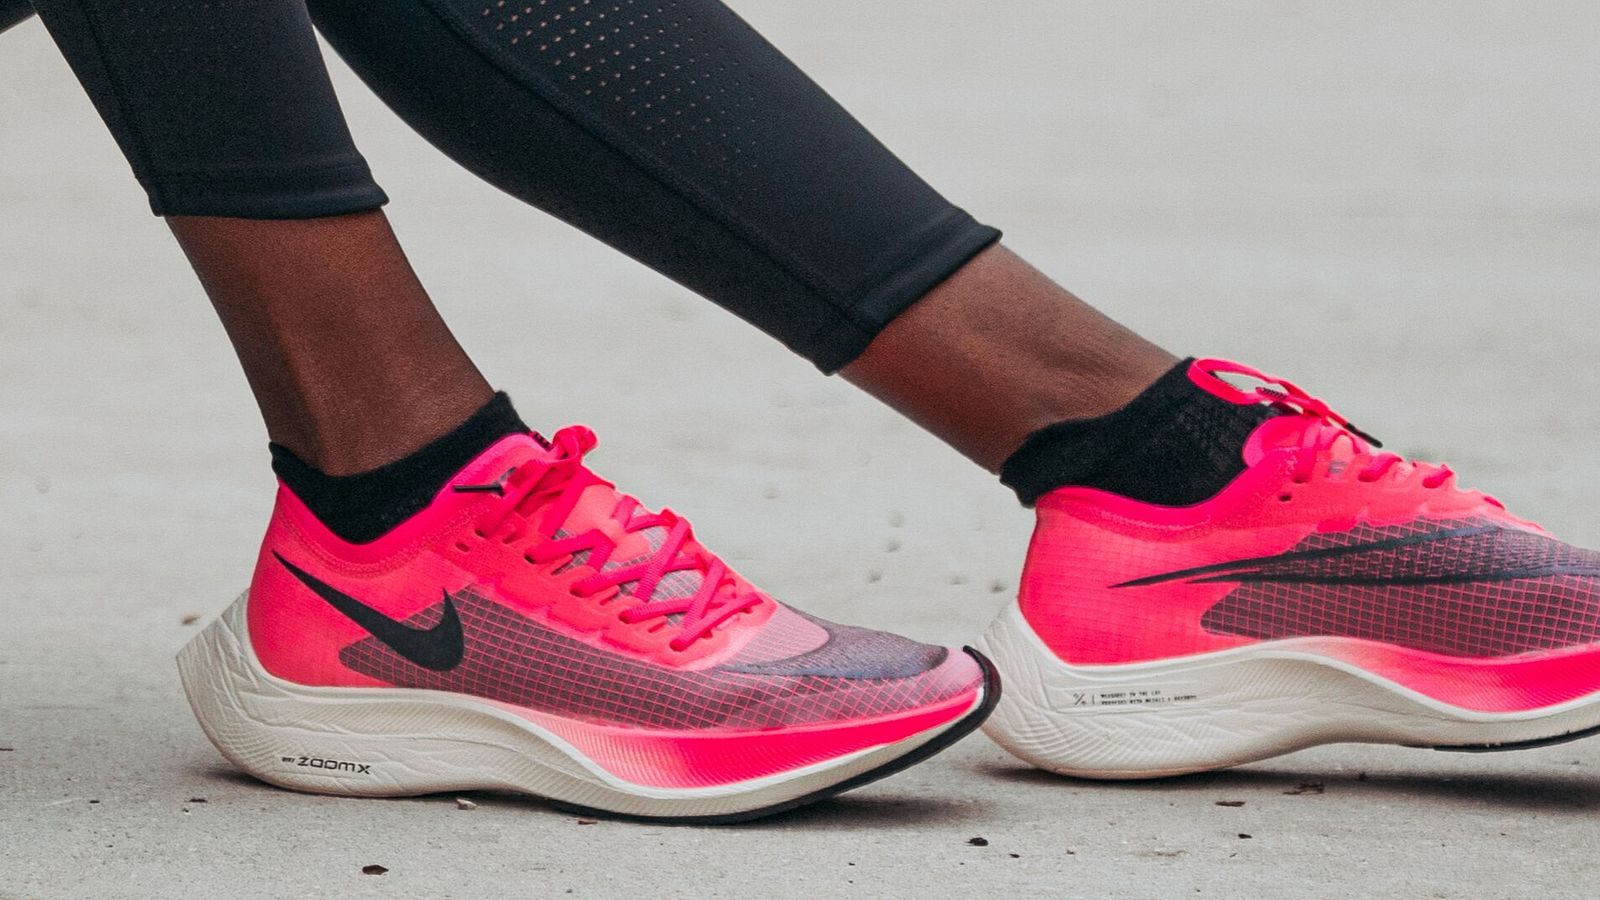 Shoe Review: Nike ZoomX Vaporfly NEXT% | Fleet Feet